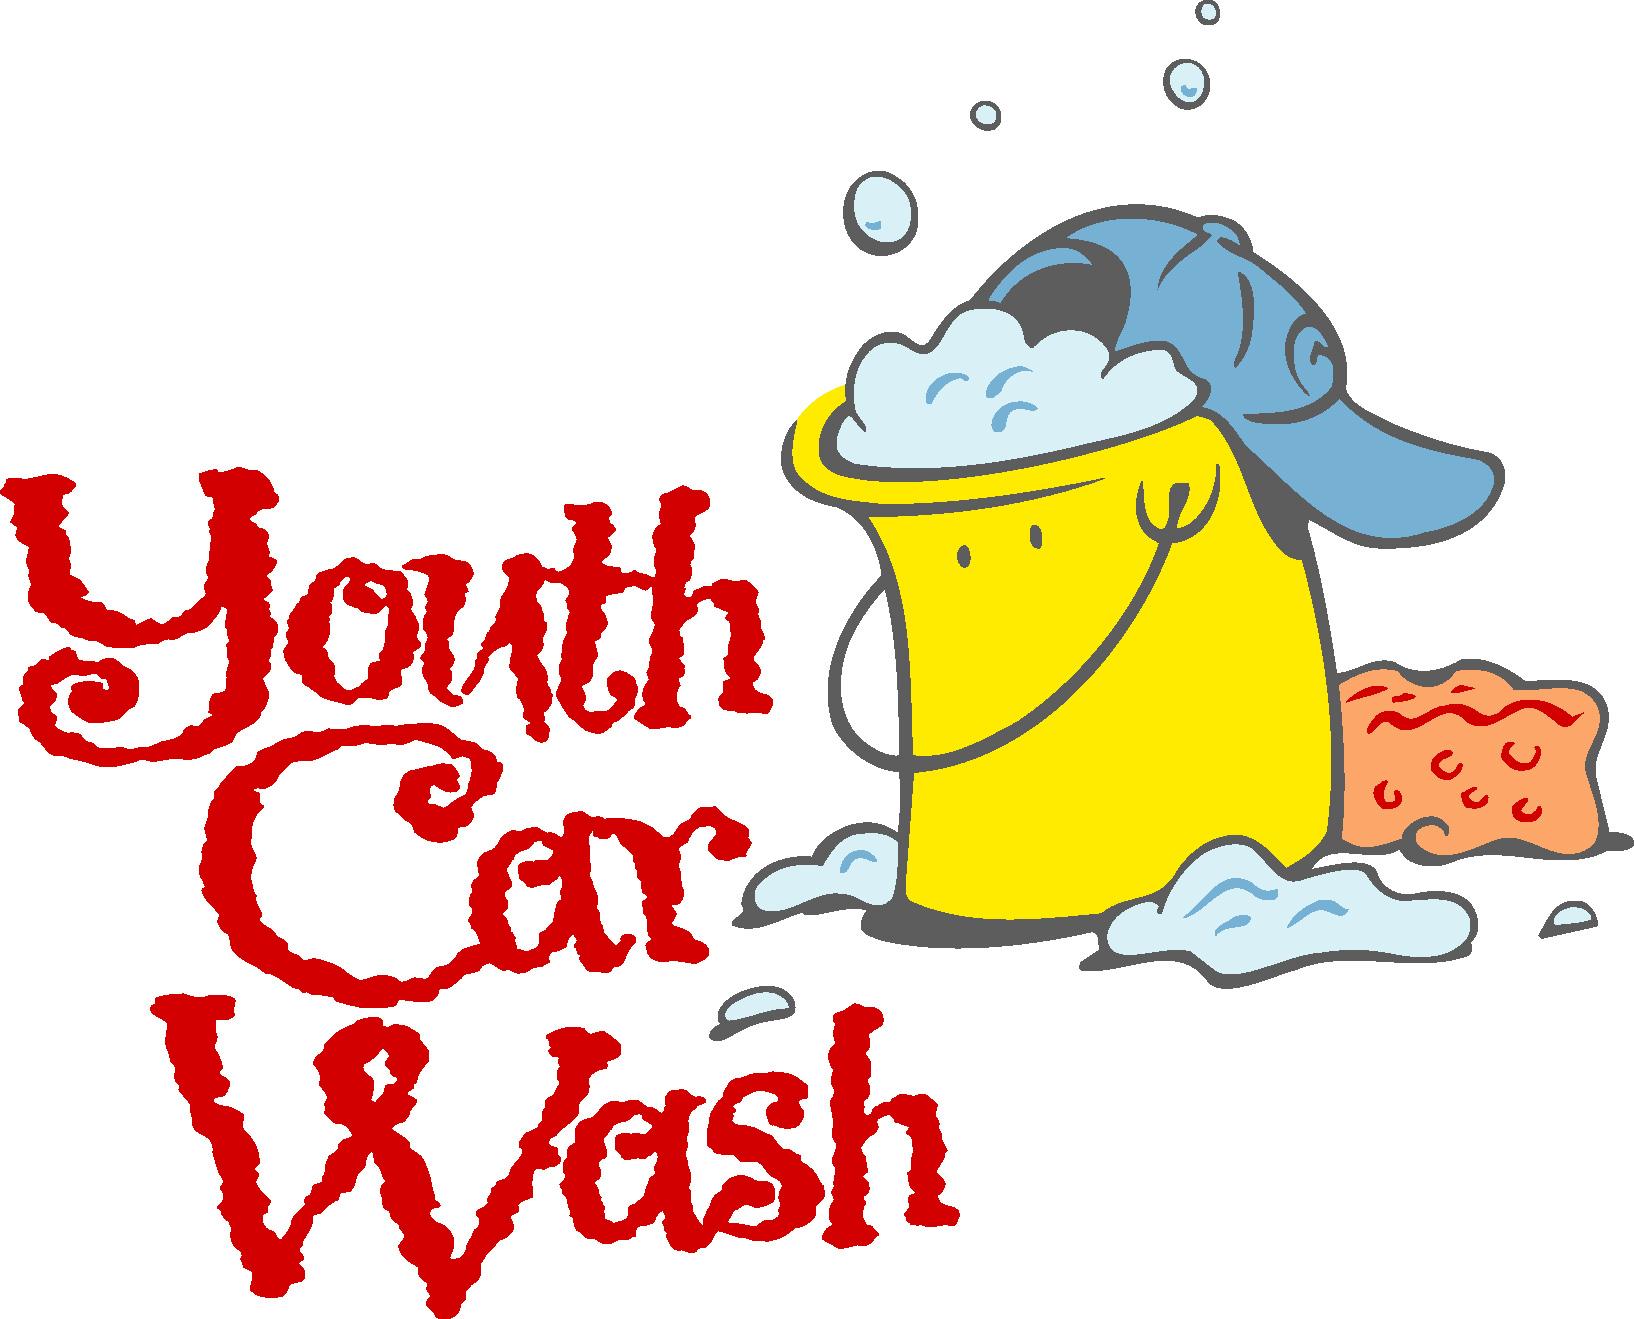 Clipart Car Wash Fundraiser